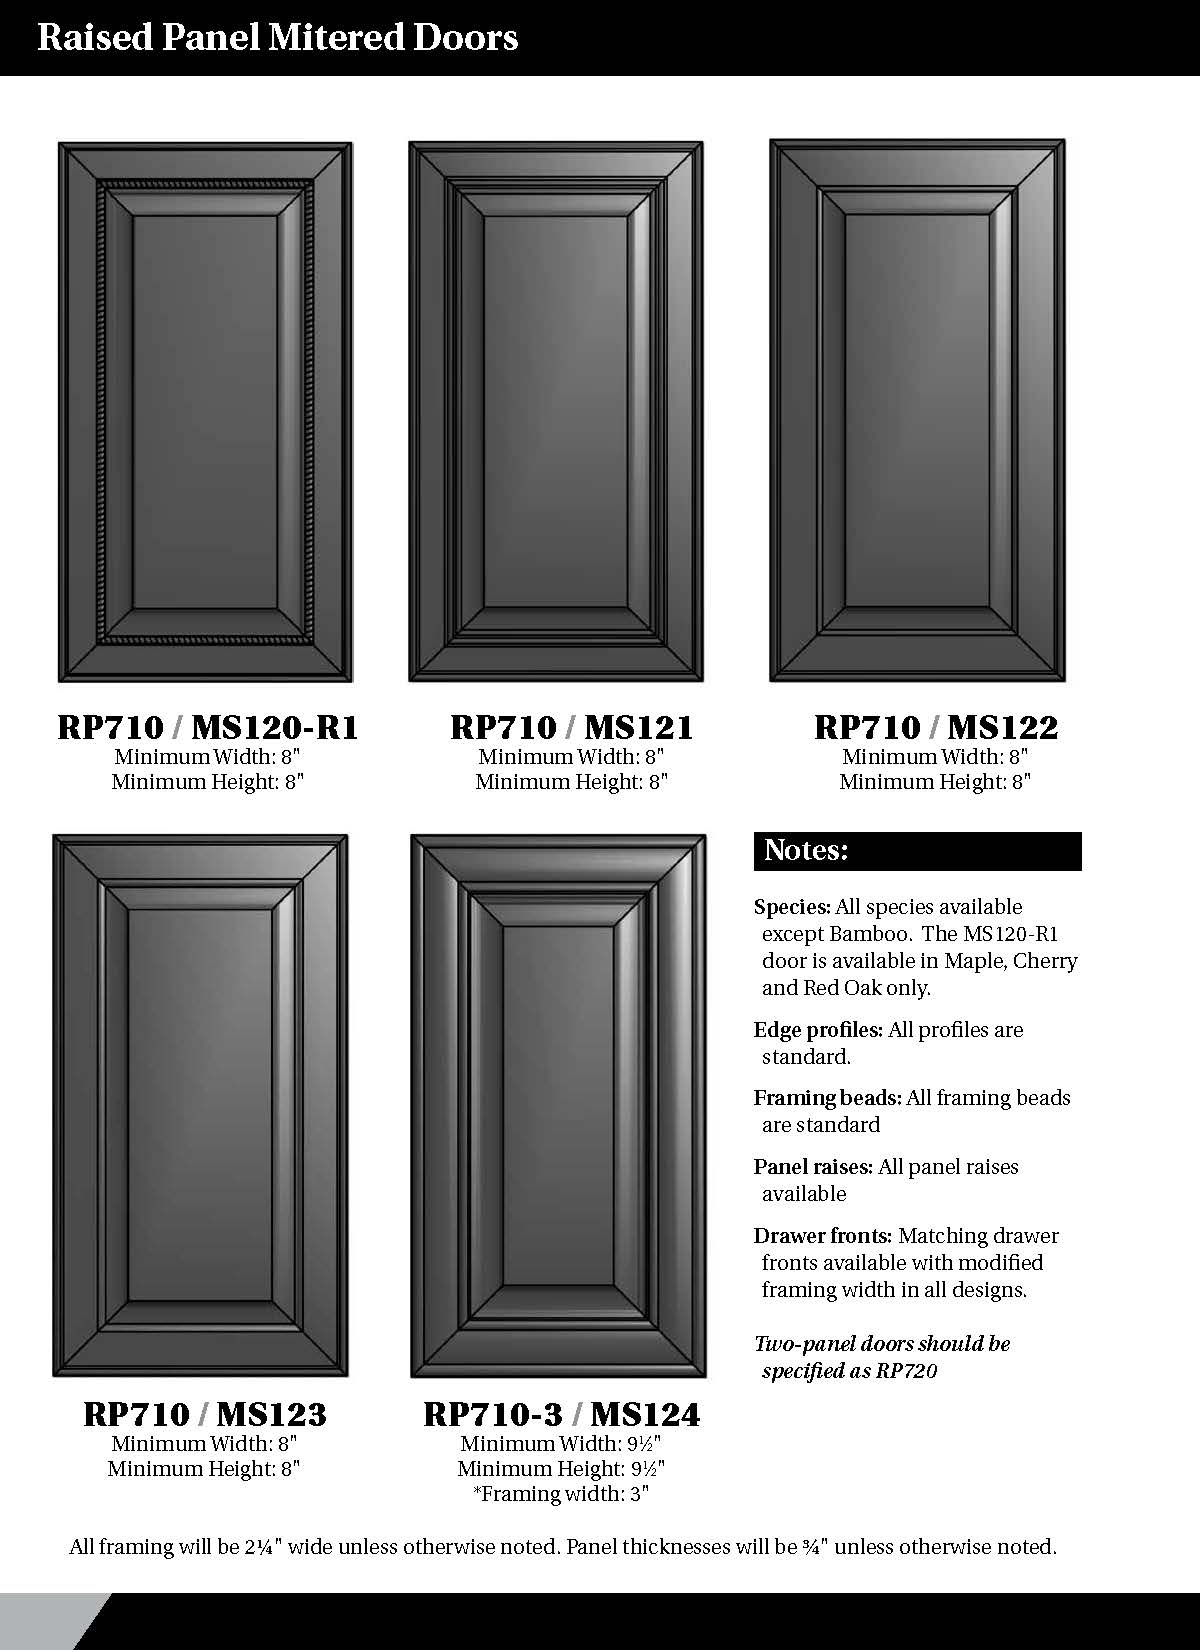 Raised-Mitered-Panel-Doors_Page_2.jpg